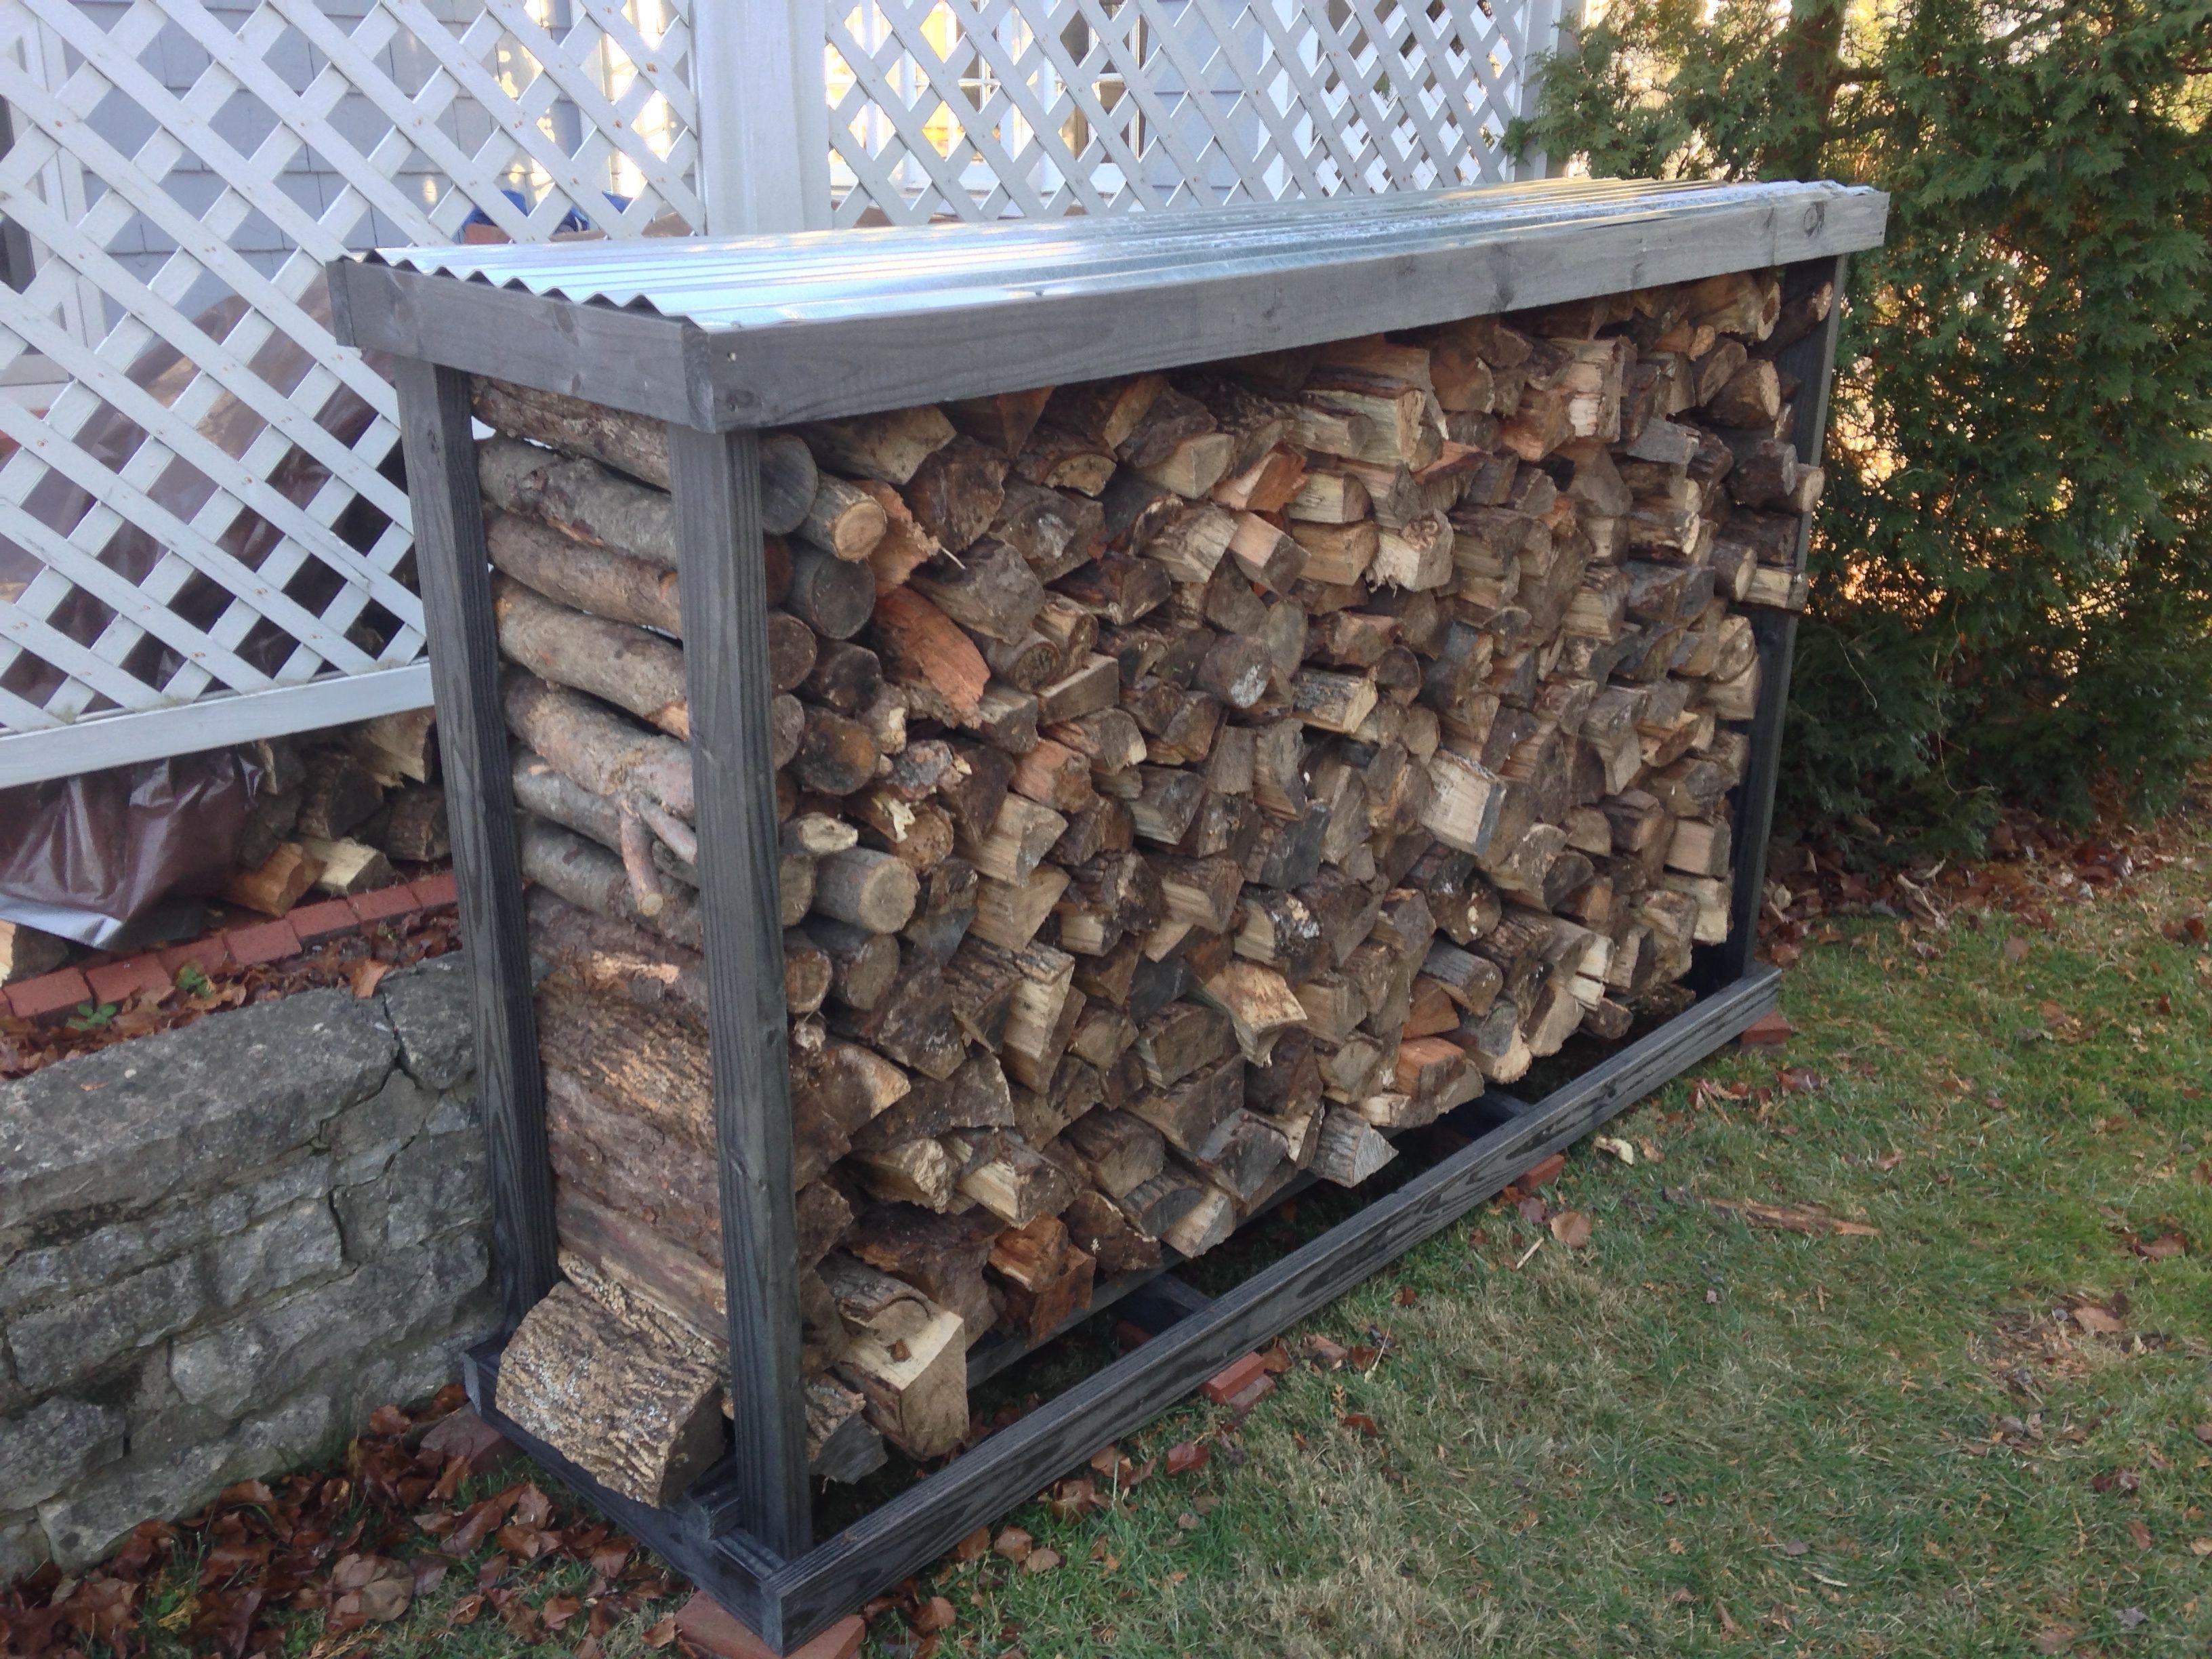 50 Homemade Firewood Rack 4x 2 X4 X5 Treated Lumber Posts